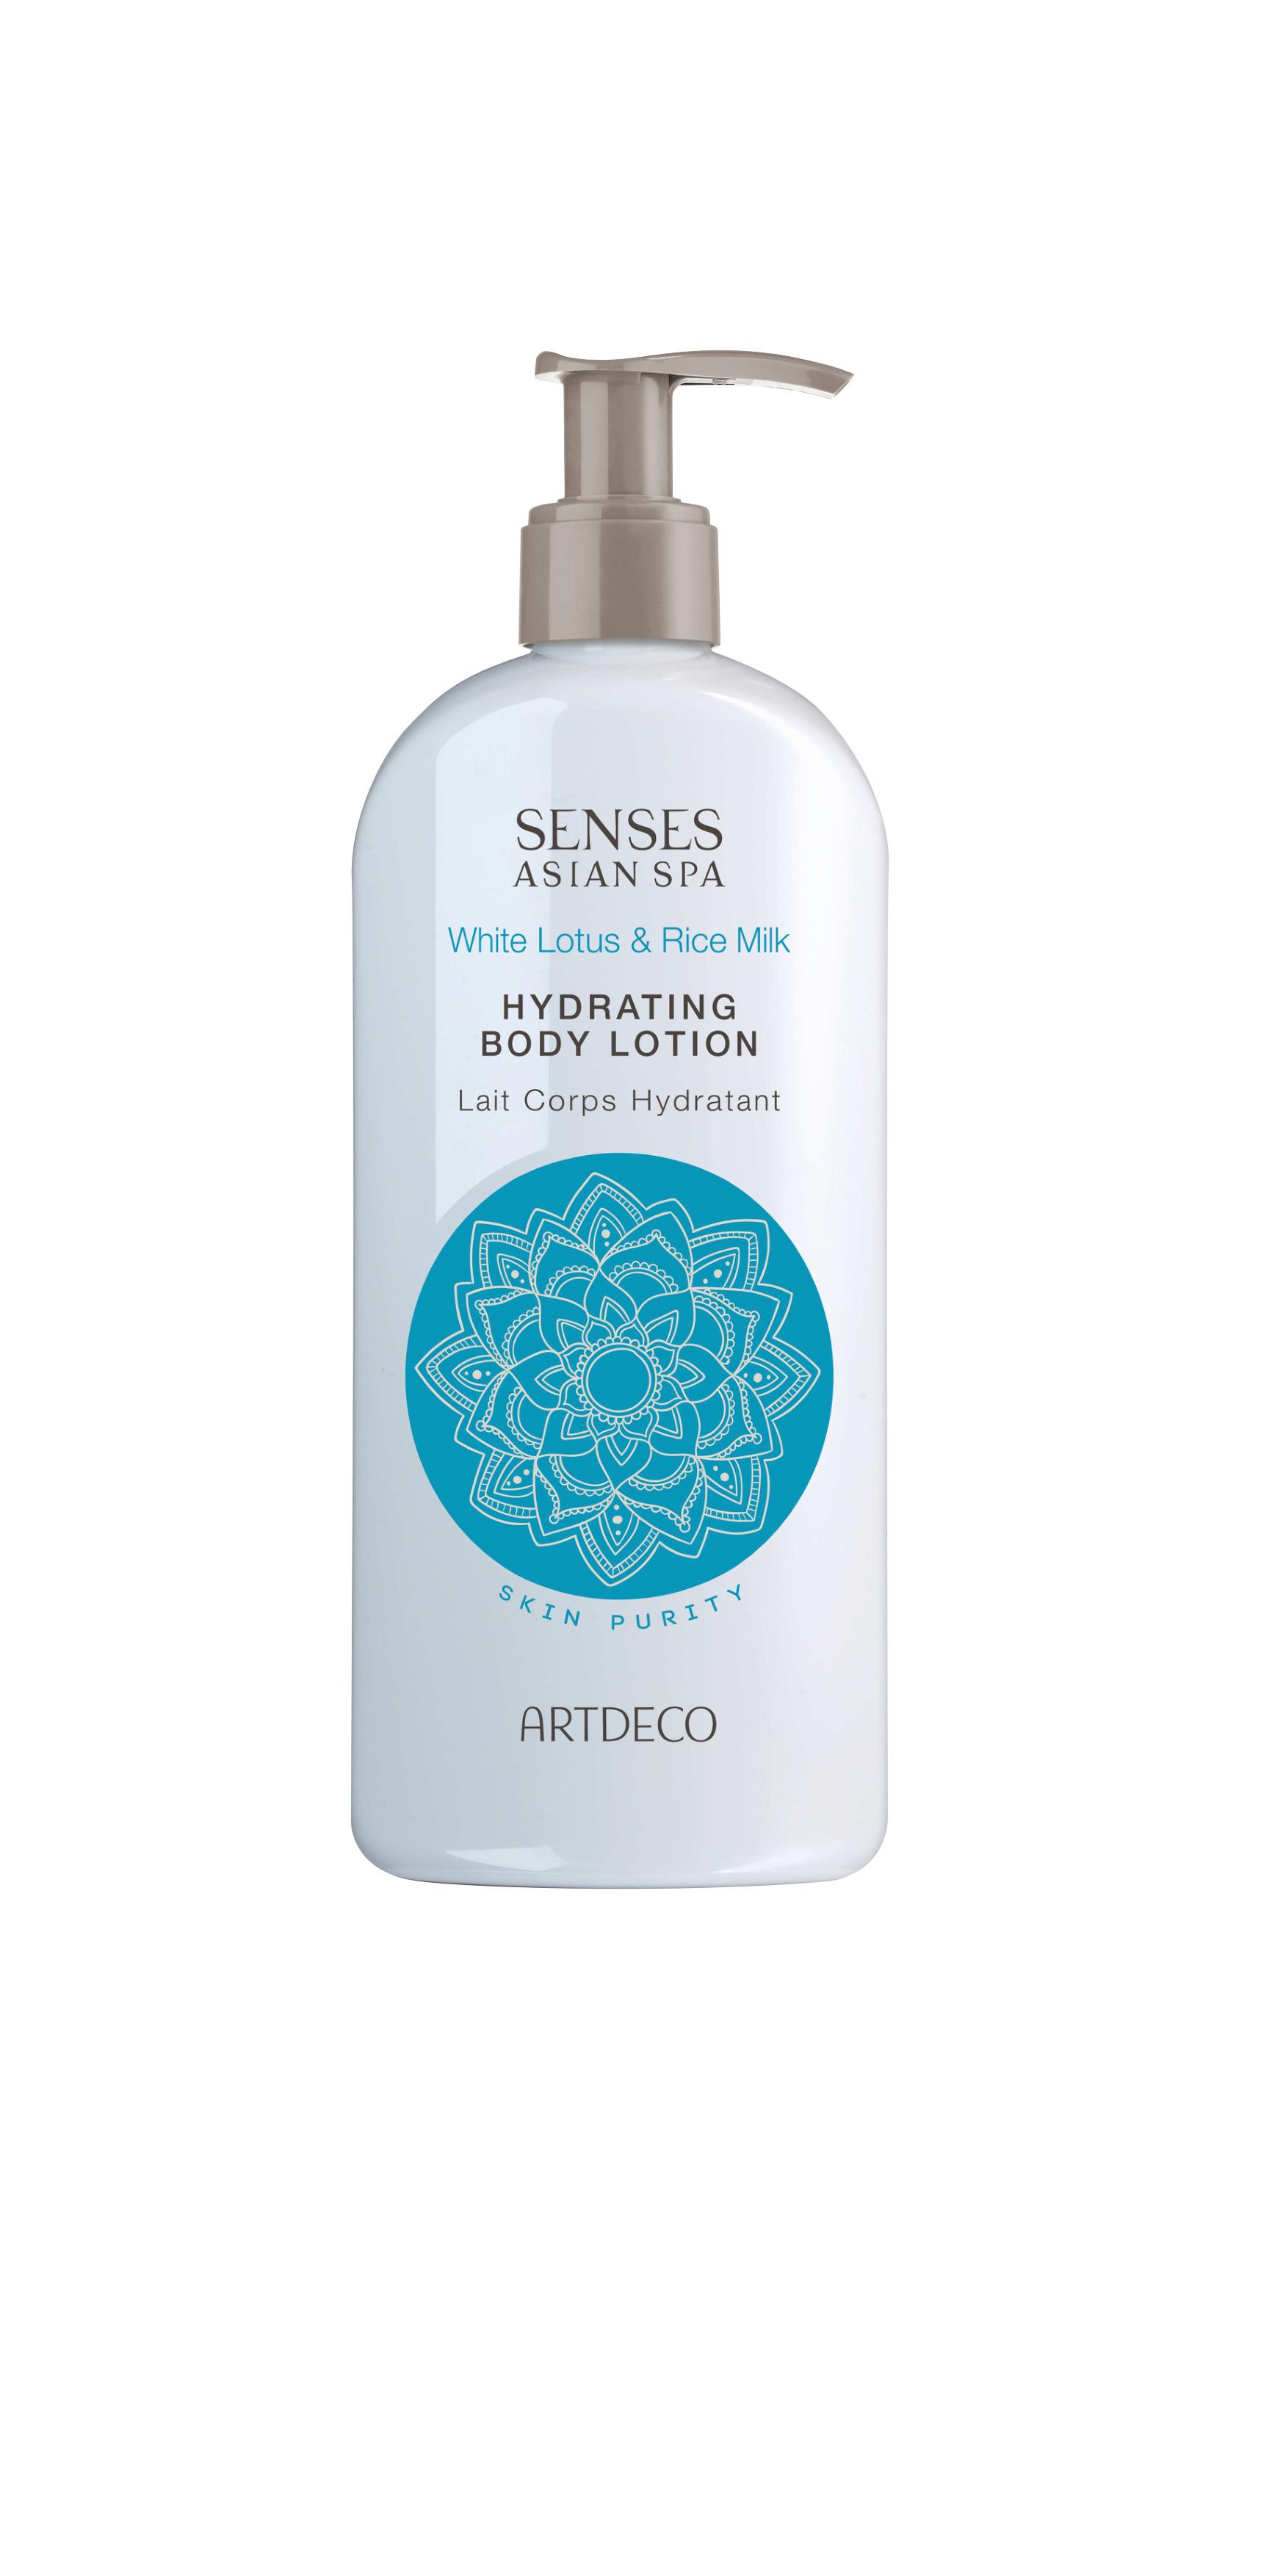 Artdeco лосьон для тела увлажняющий Hydrating body lotion, skin purity, 200 мл logona daily care body lotion organic aloe verbena объем 200 мл